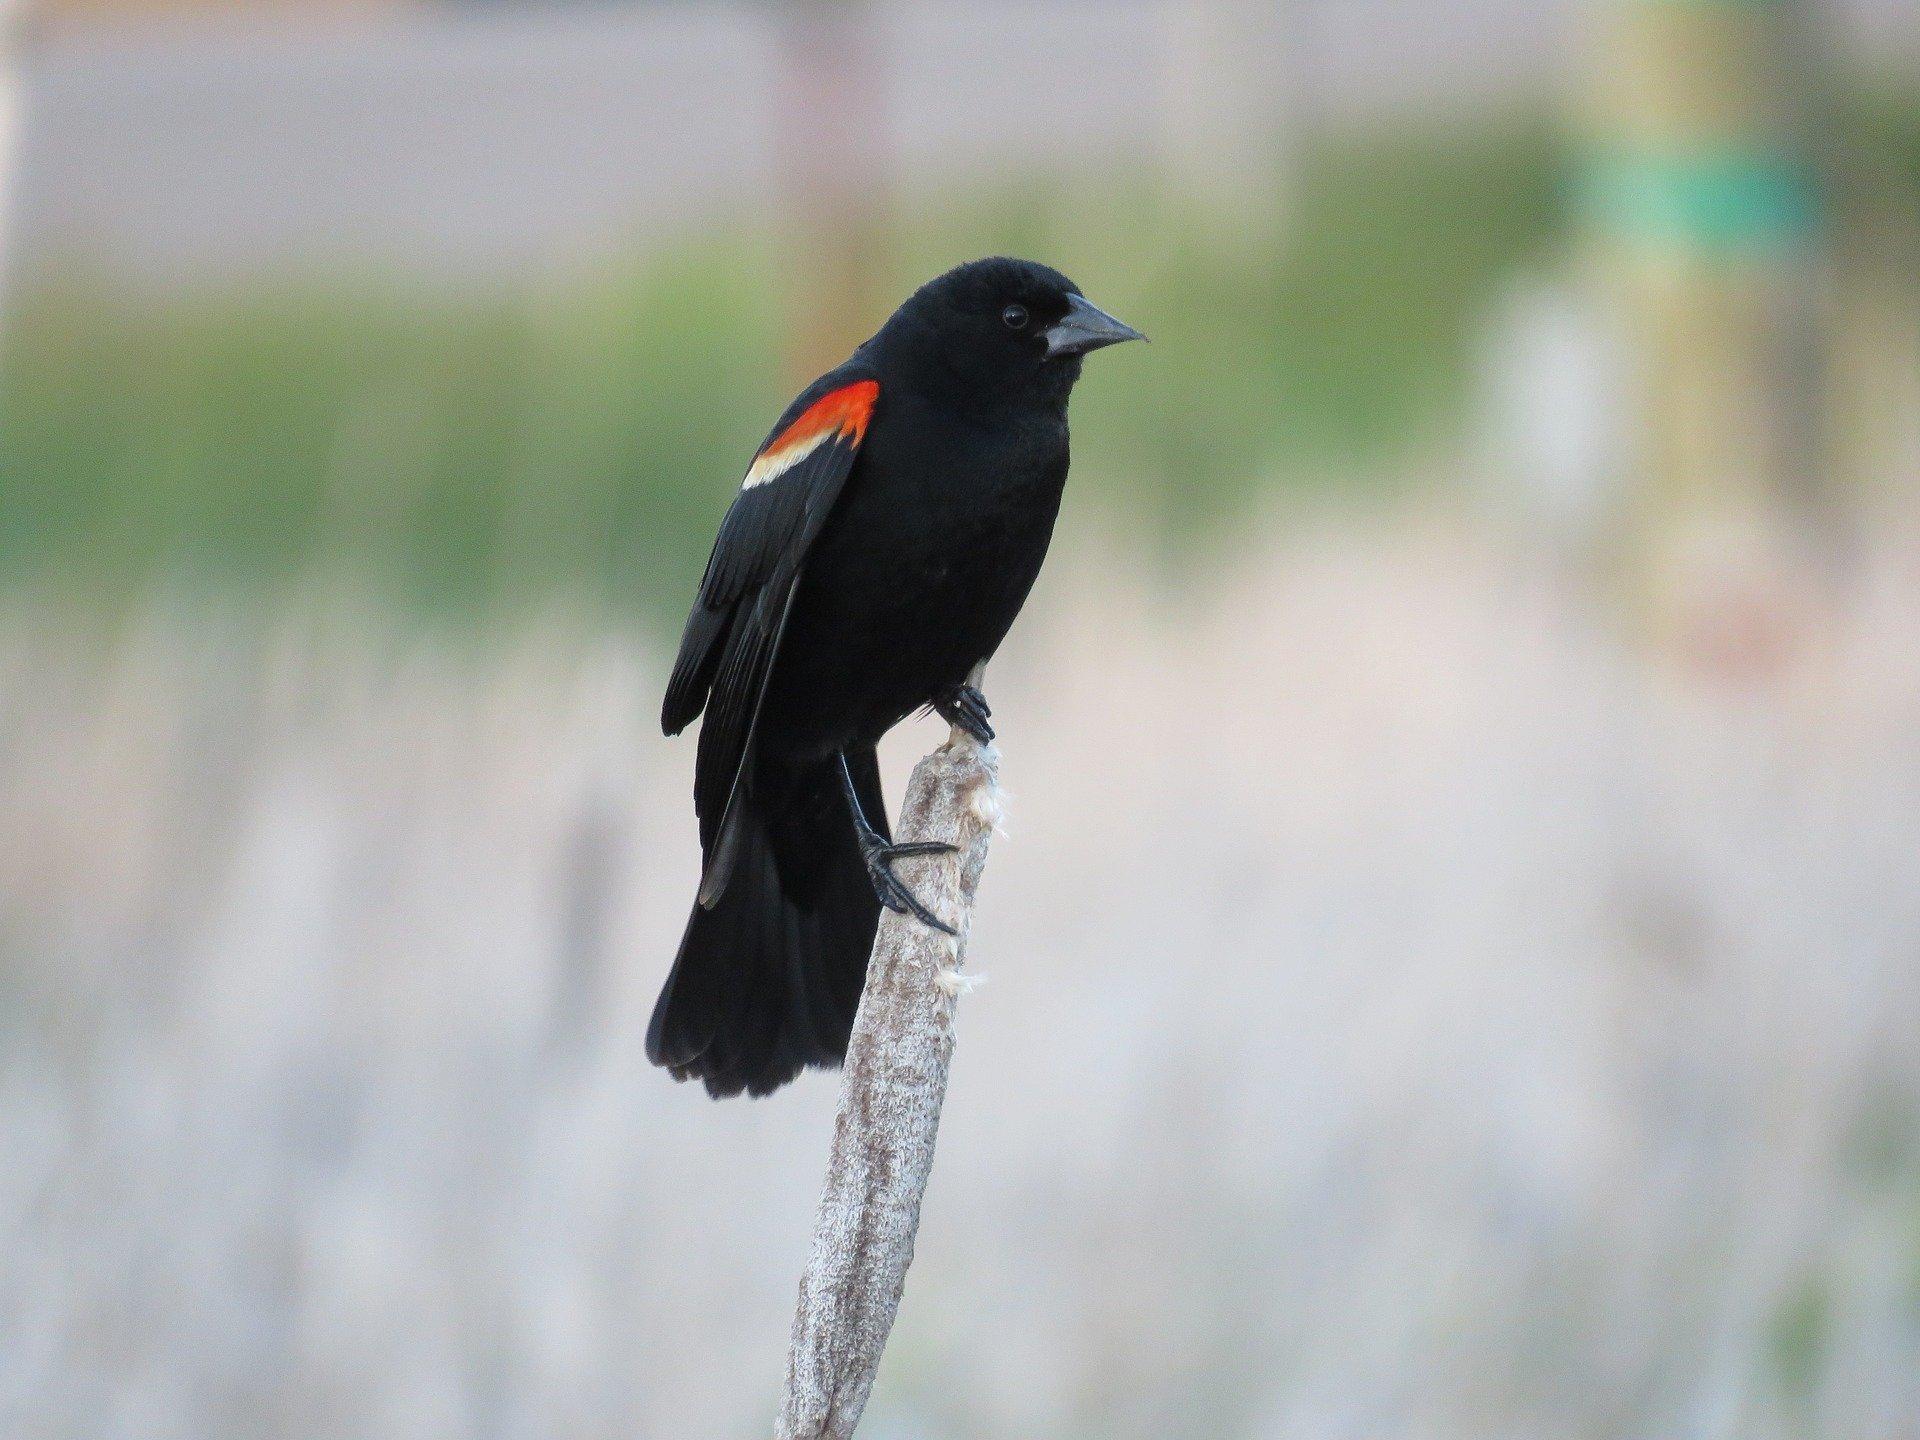 red-winged-blackbird-1427770_1920 (1)